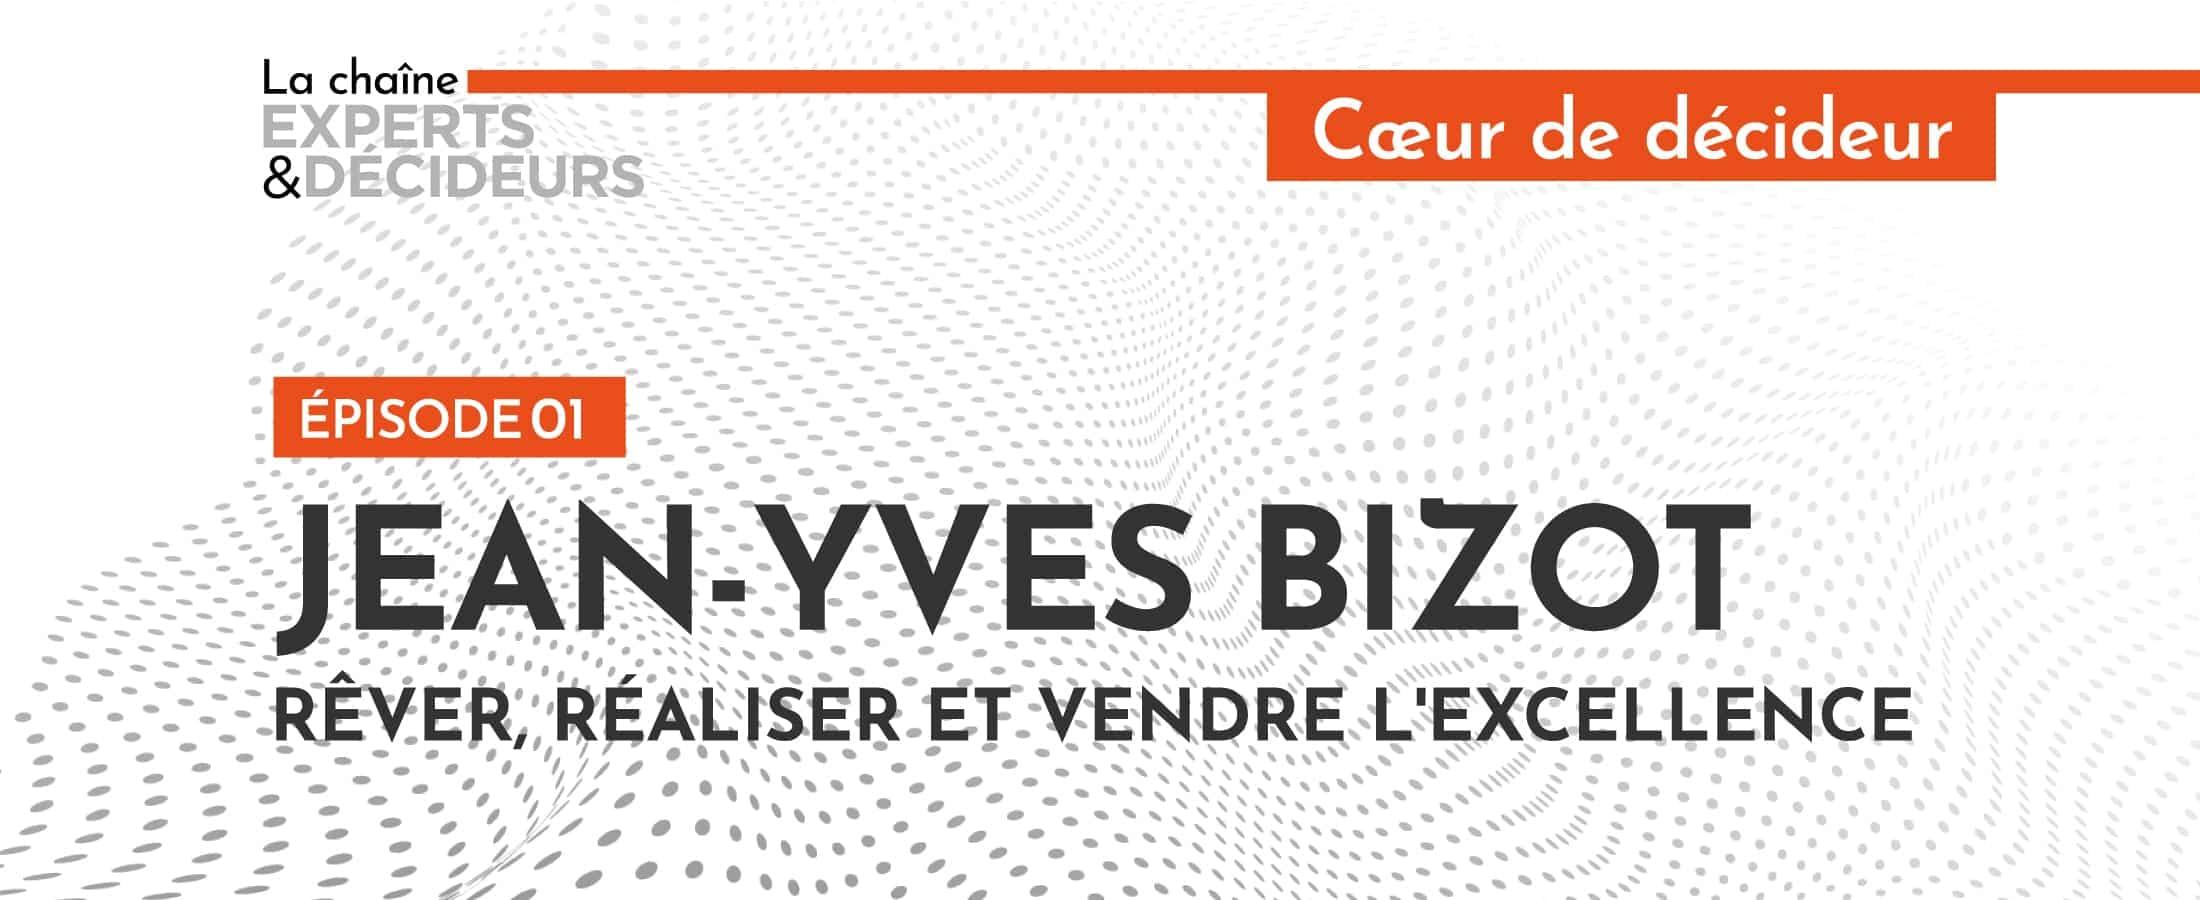 [Podcast] Jean-Yves Bizot: rêver, réaliser et vendre l'excellence